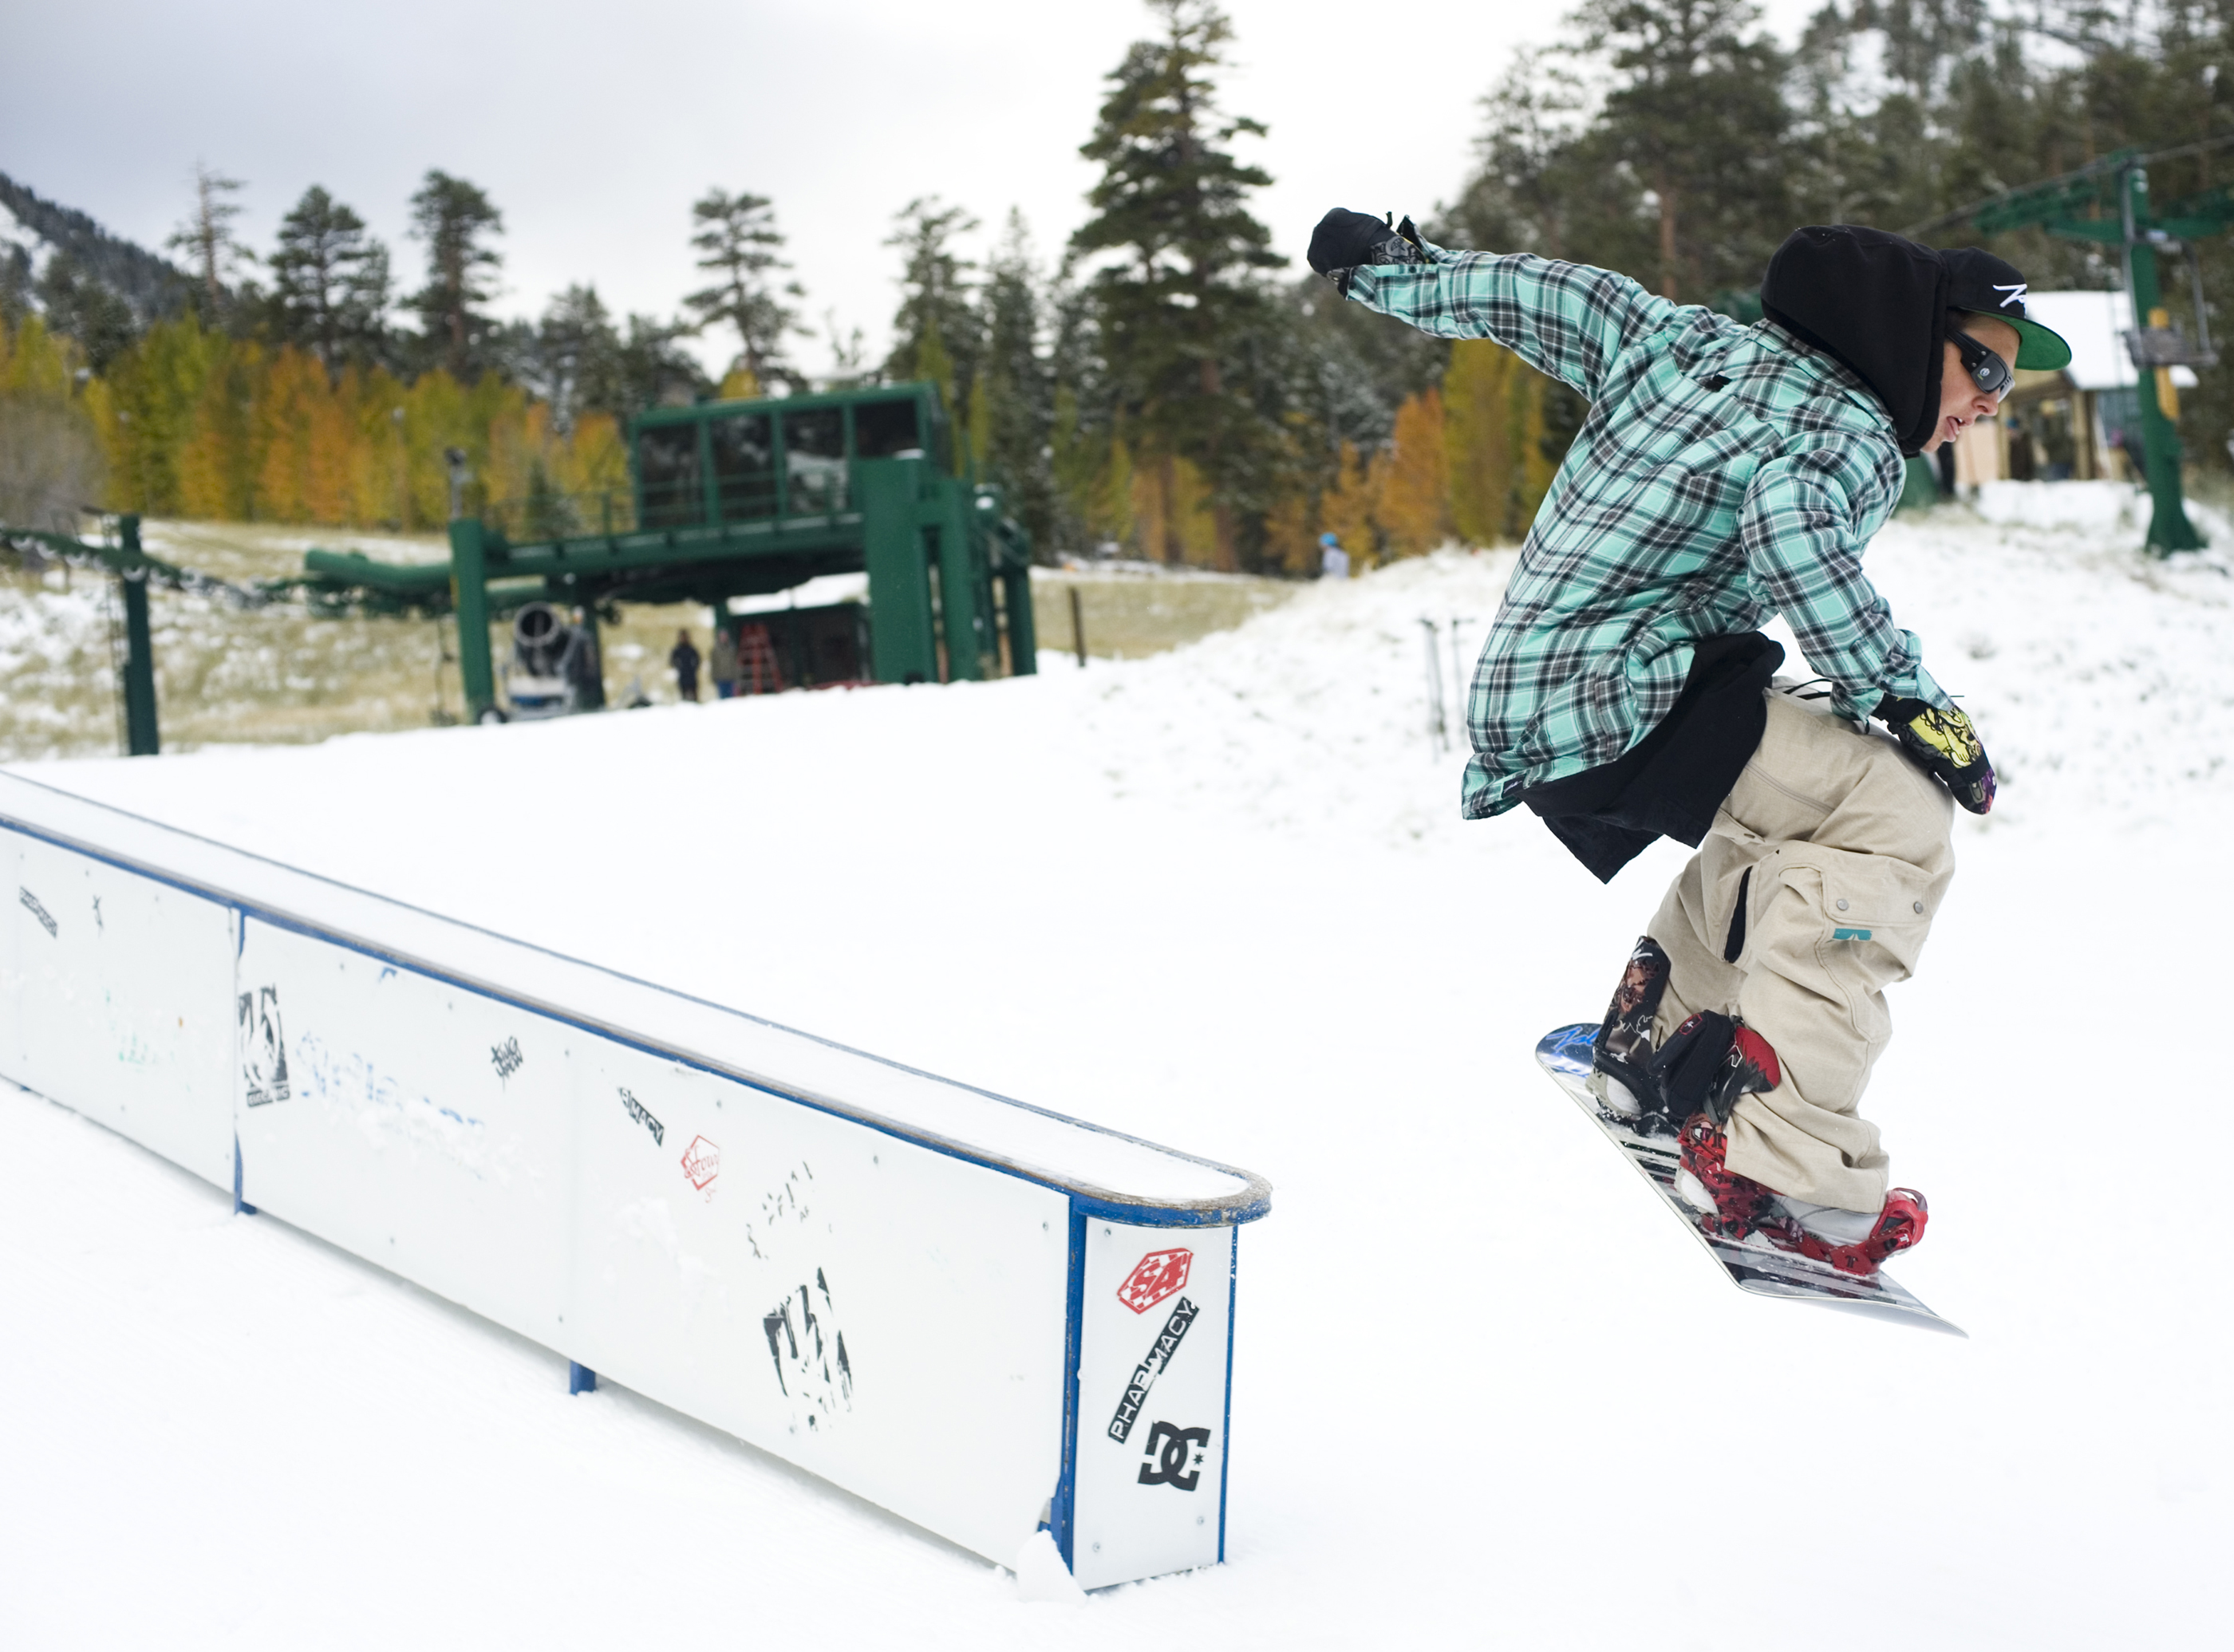 skiresortopen006